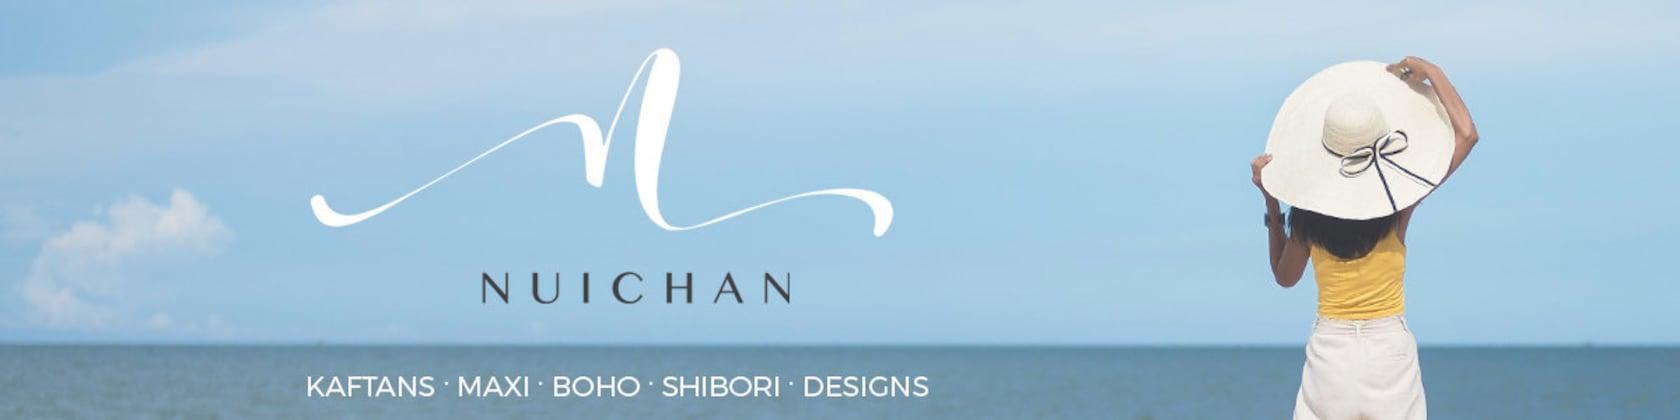 Maxi dress. Kaftans . Boho & Shibori Designs por Nuichan en Etsy